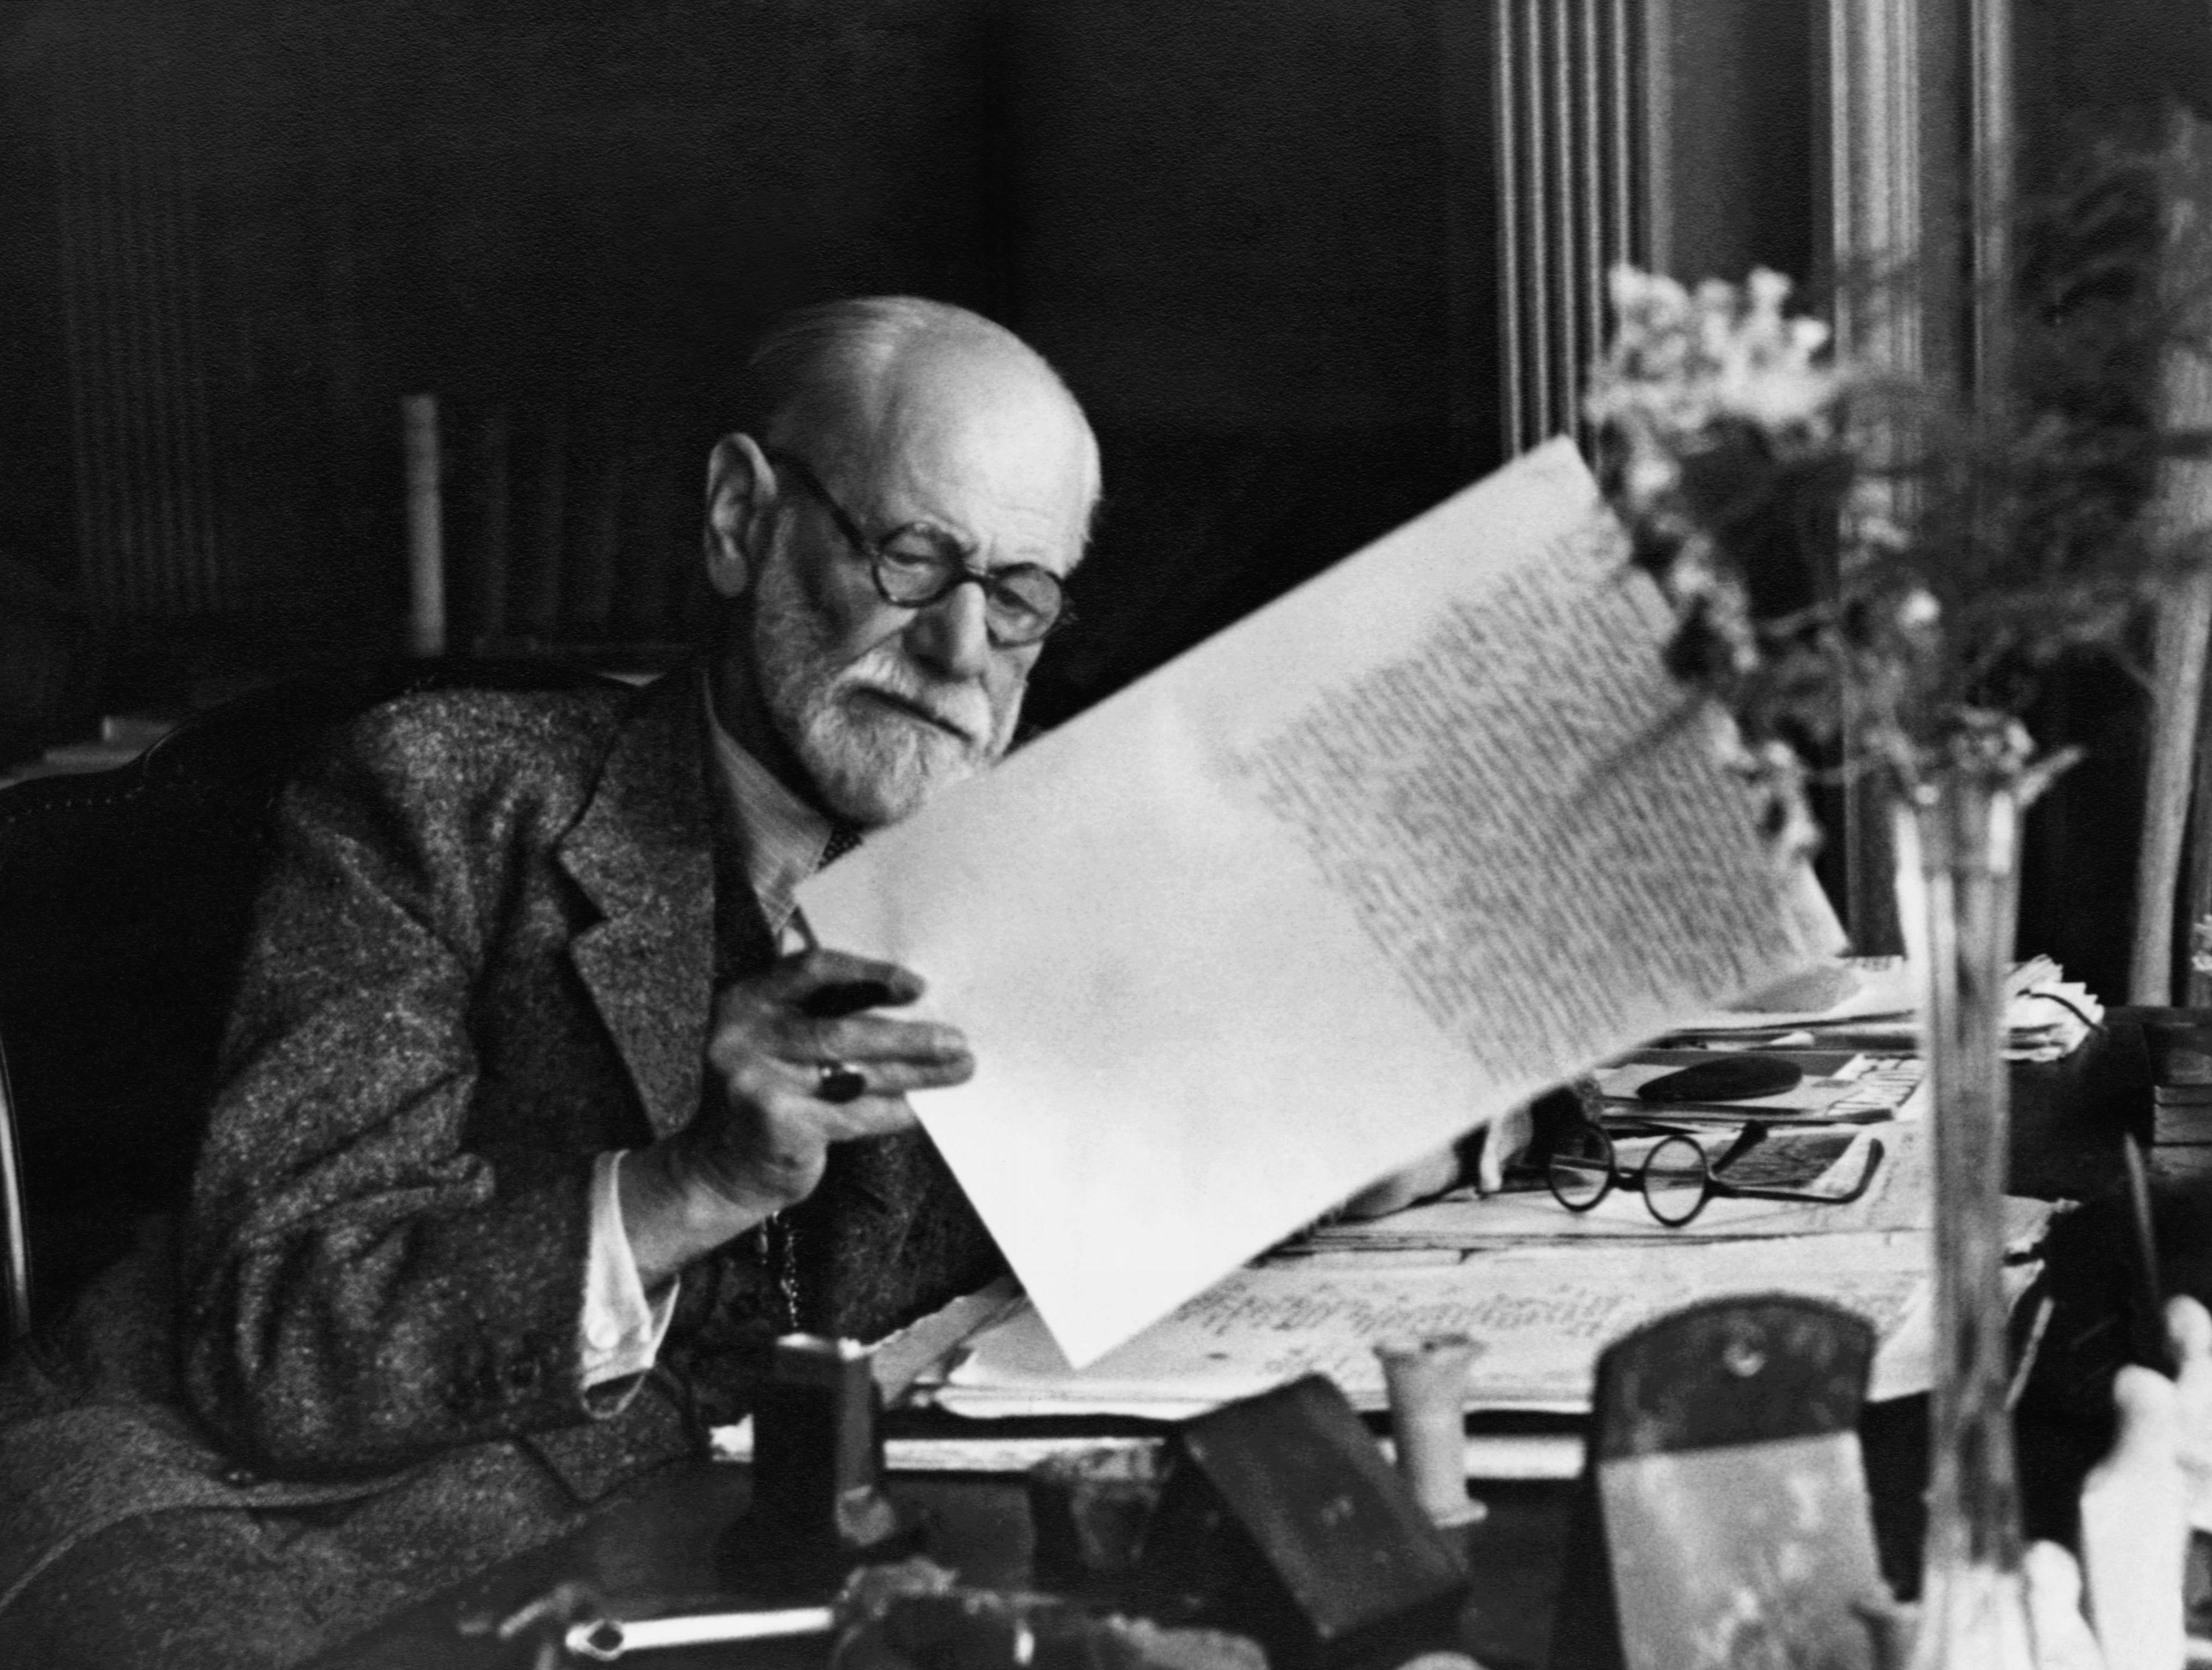 Sigmund Freud 4k Ultra HD Wallpaper Background Image 4048x3057 4048x3057